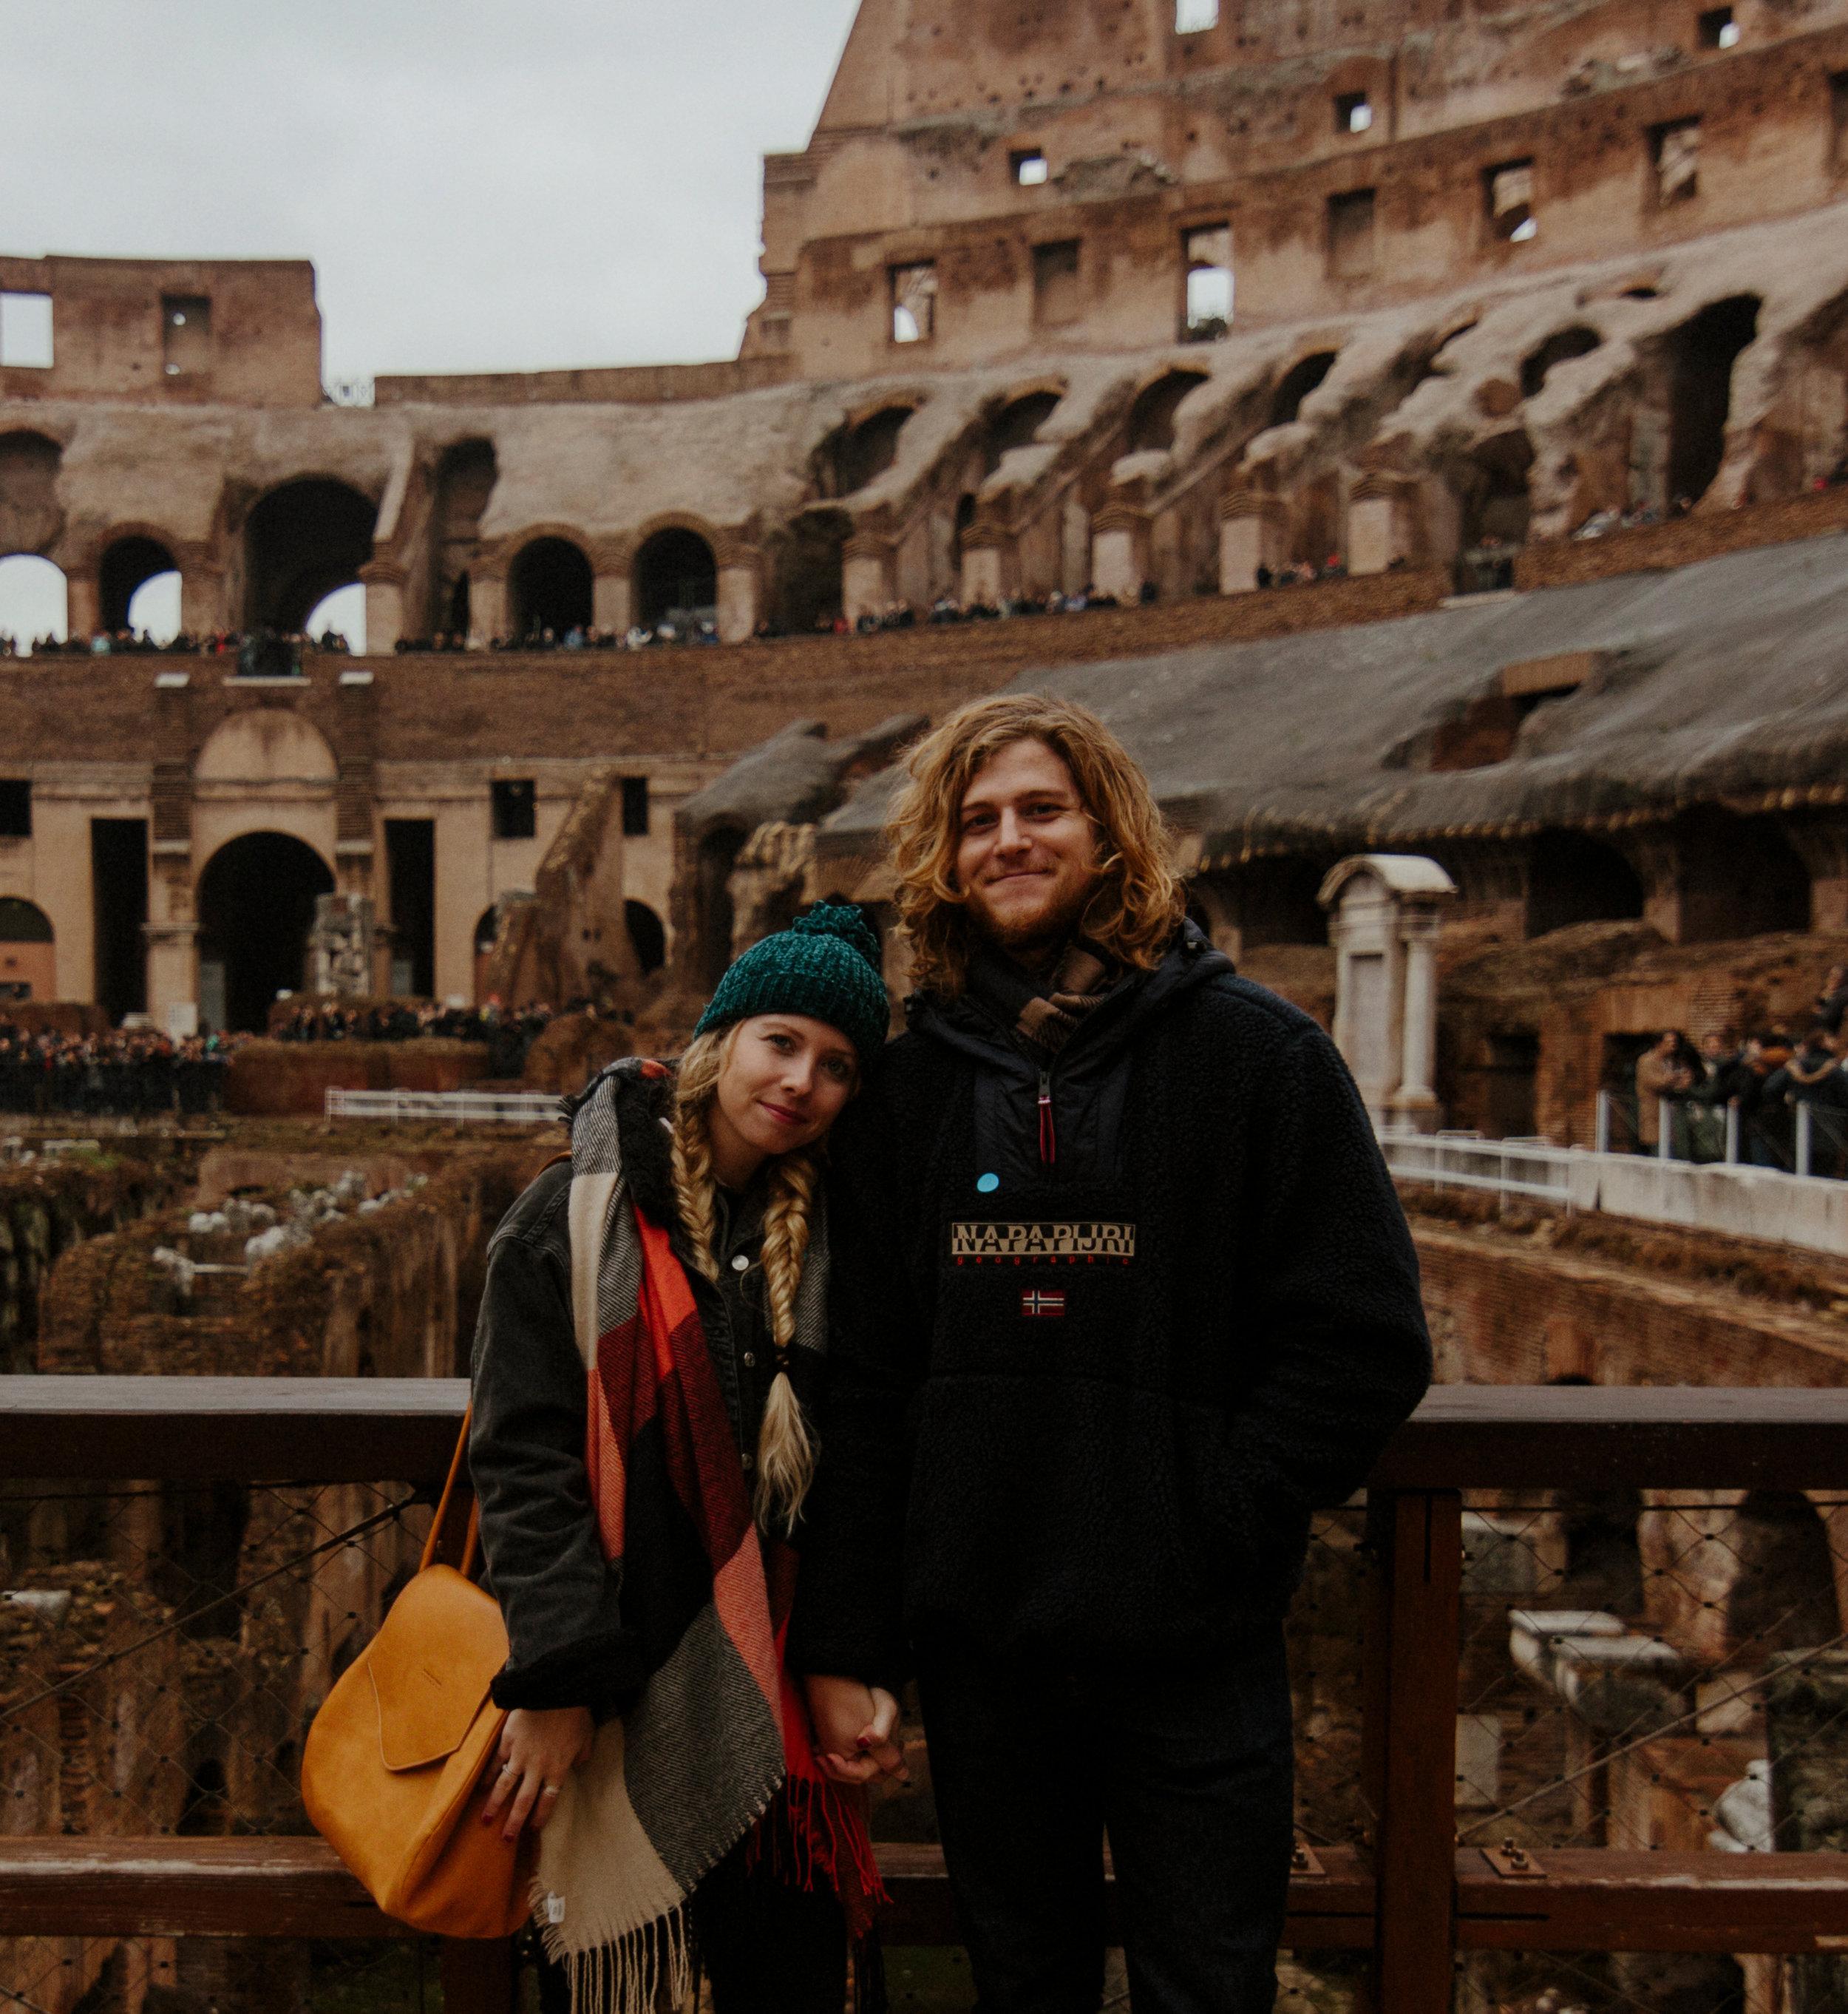 Italy Happily Shavers Website-136Italy Happily Shavers Website Grain.jpg